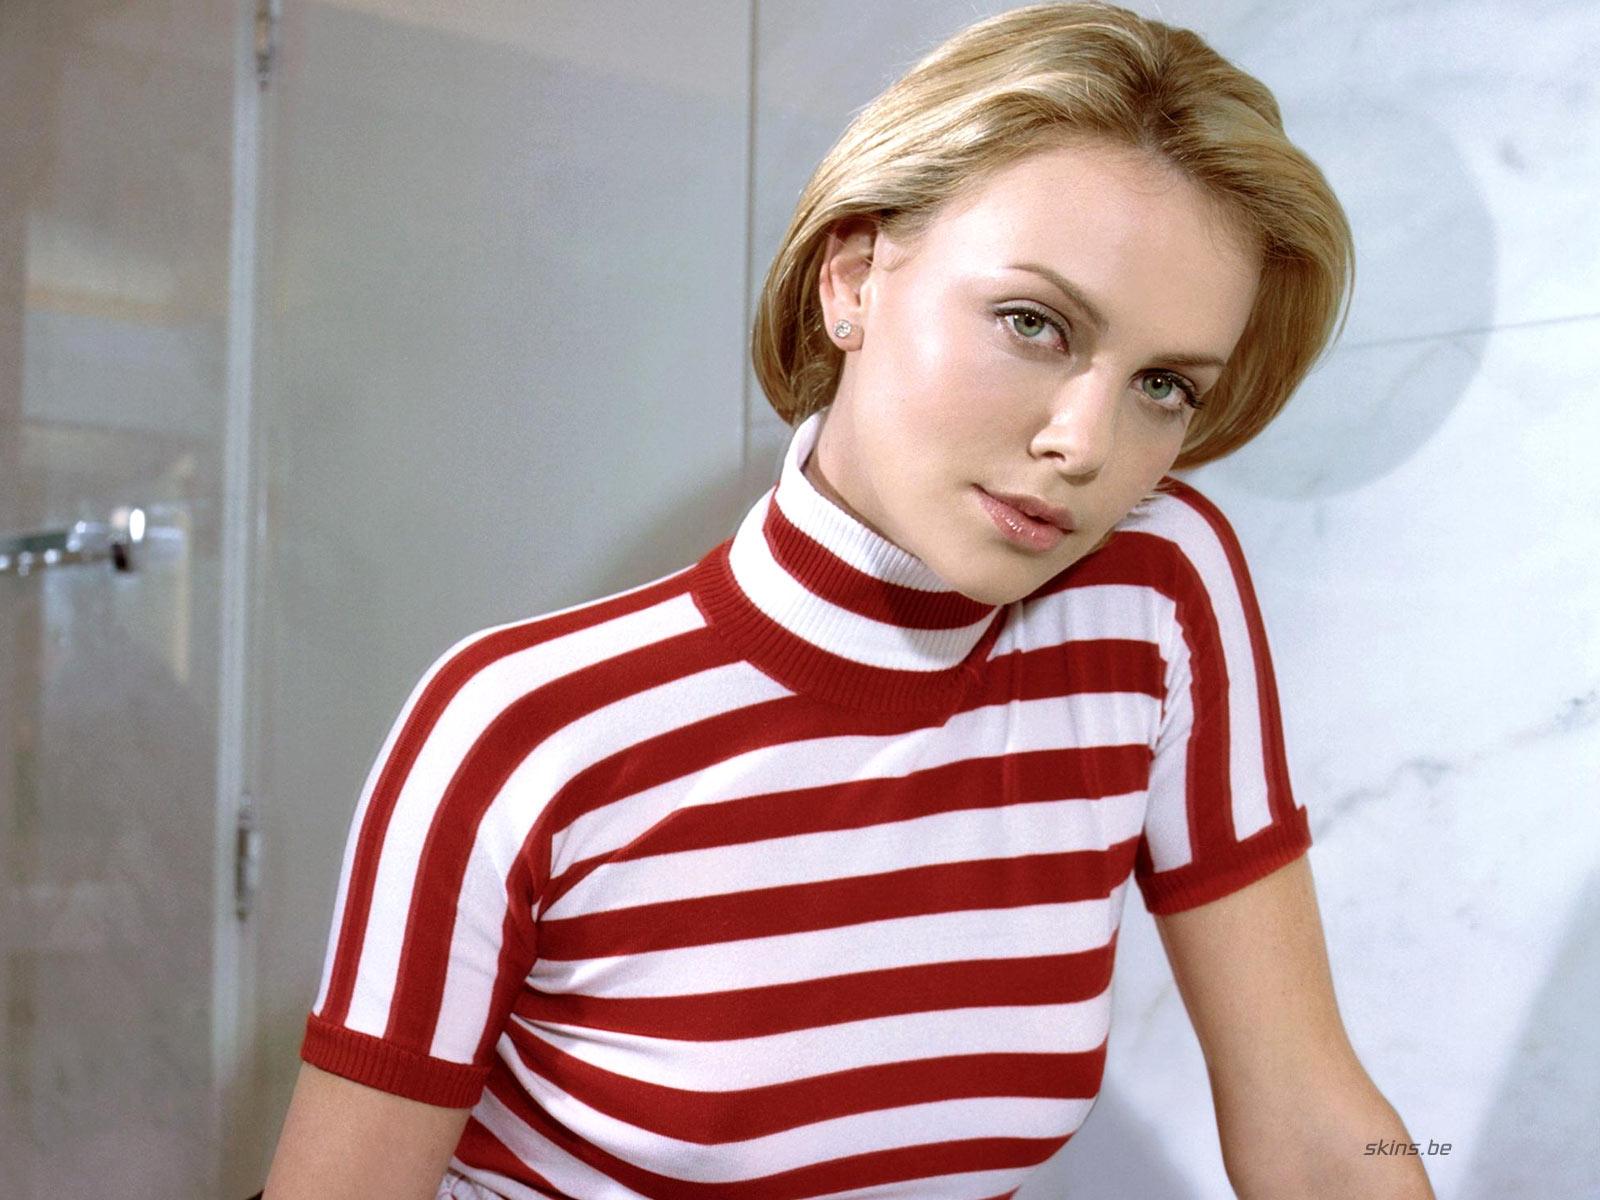 http://2.bp.blogspot.com/_GCAuqodmOE4/TS_ZEiDQ7fI/AAAAAAAAG-s/Rrv5cSaeTZw/s1600/Charlize+Theron+In+Sexy+Strip+Shirt+Photos+%25288%2529.jpg